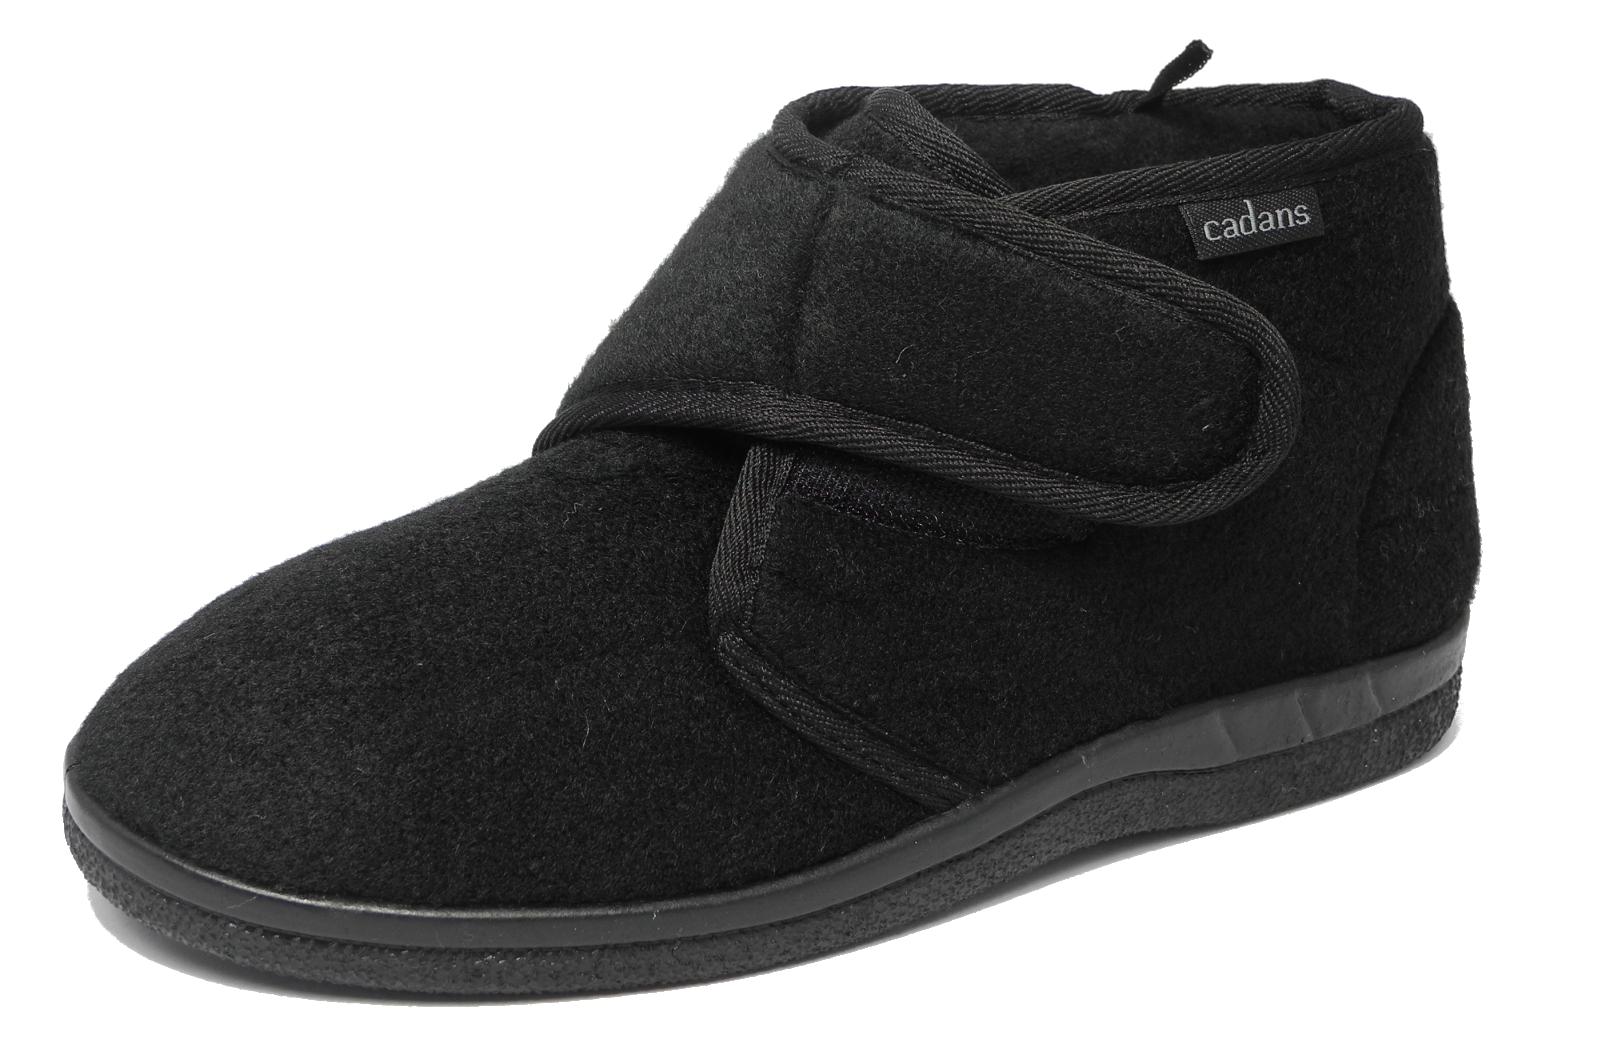 mens sturdy thick felt fleece lined velcro boots bootie. Black Bedroom Furniture Sets. Home Design Ideas